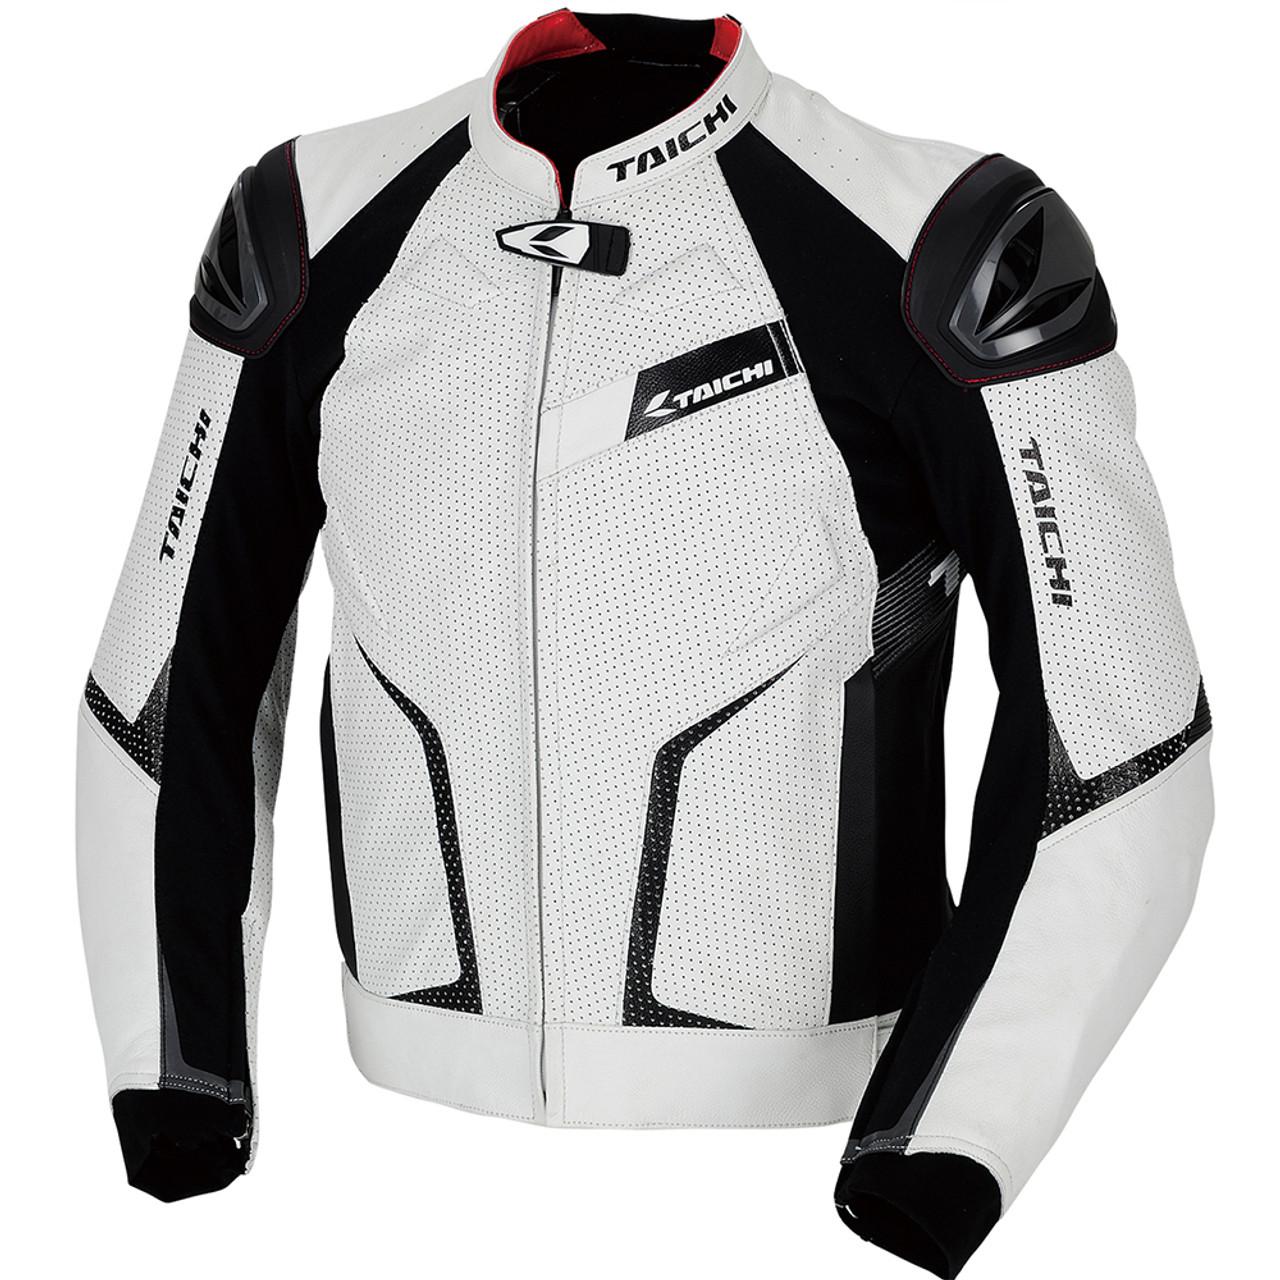 Rs Taichi Rsj832 Gmx Arrow Leather Jacket Rs Taichi Jacket